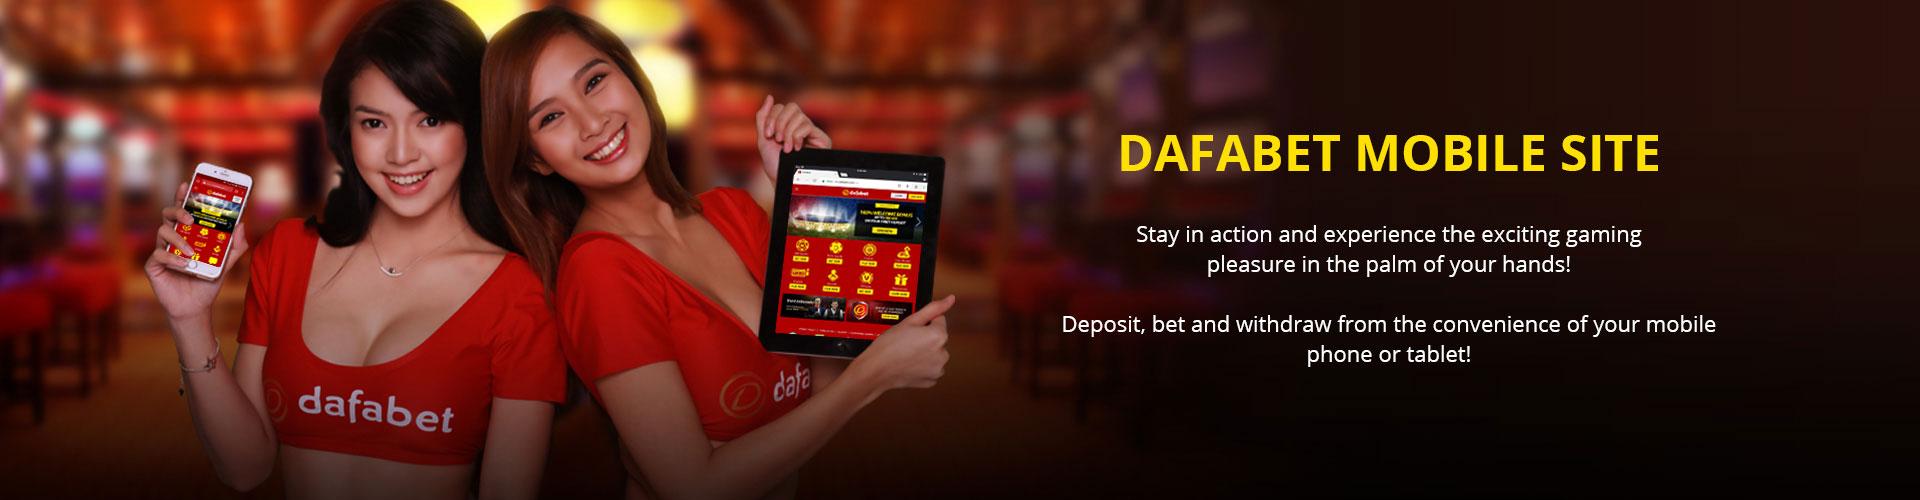 dafabet mobile betting in uganda